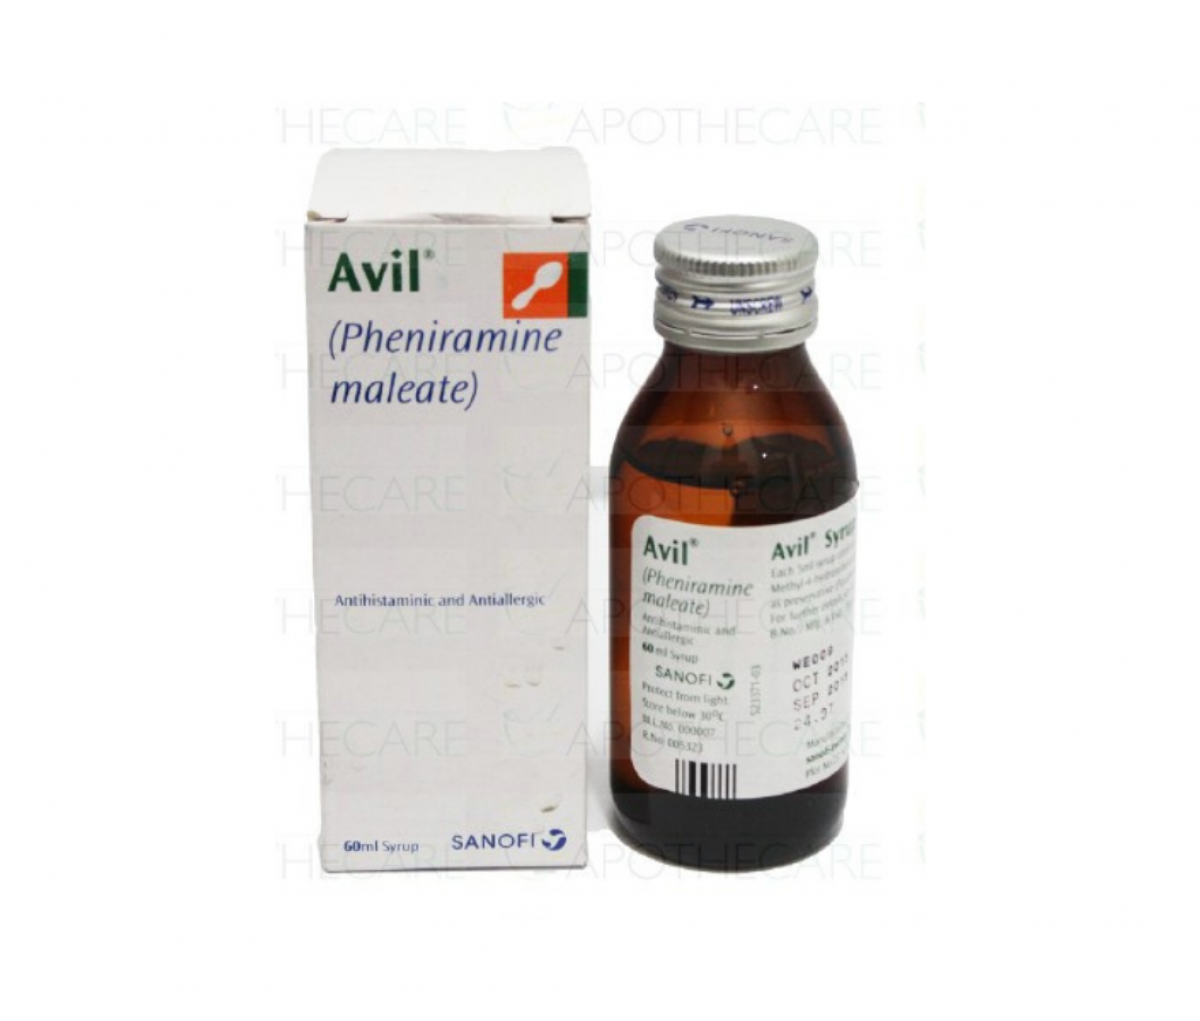 Avil 15mg/5ml Syrup 60ml